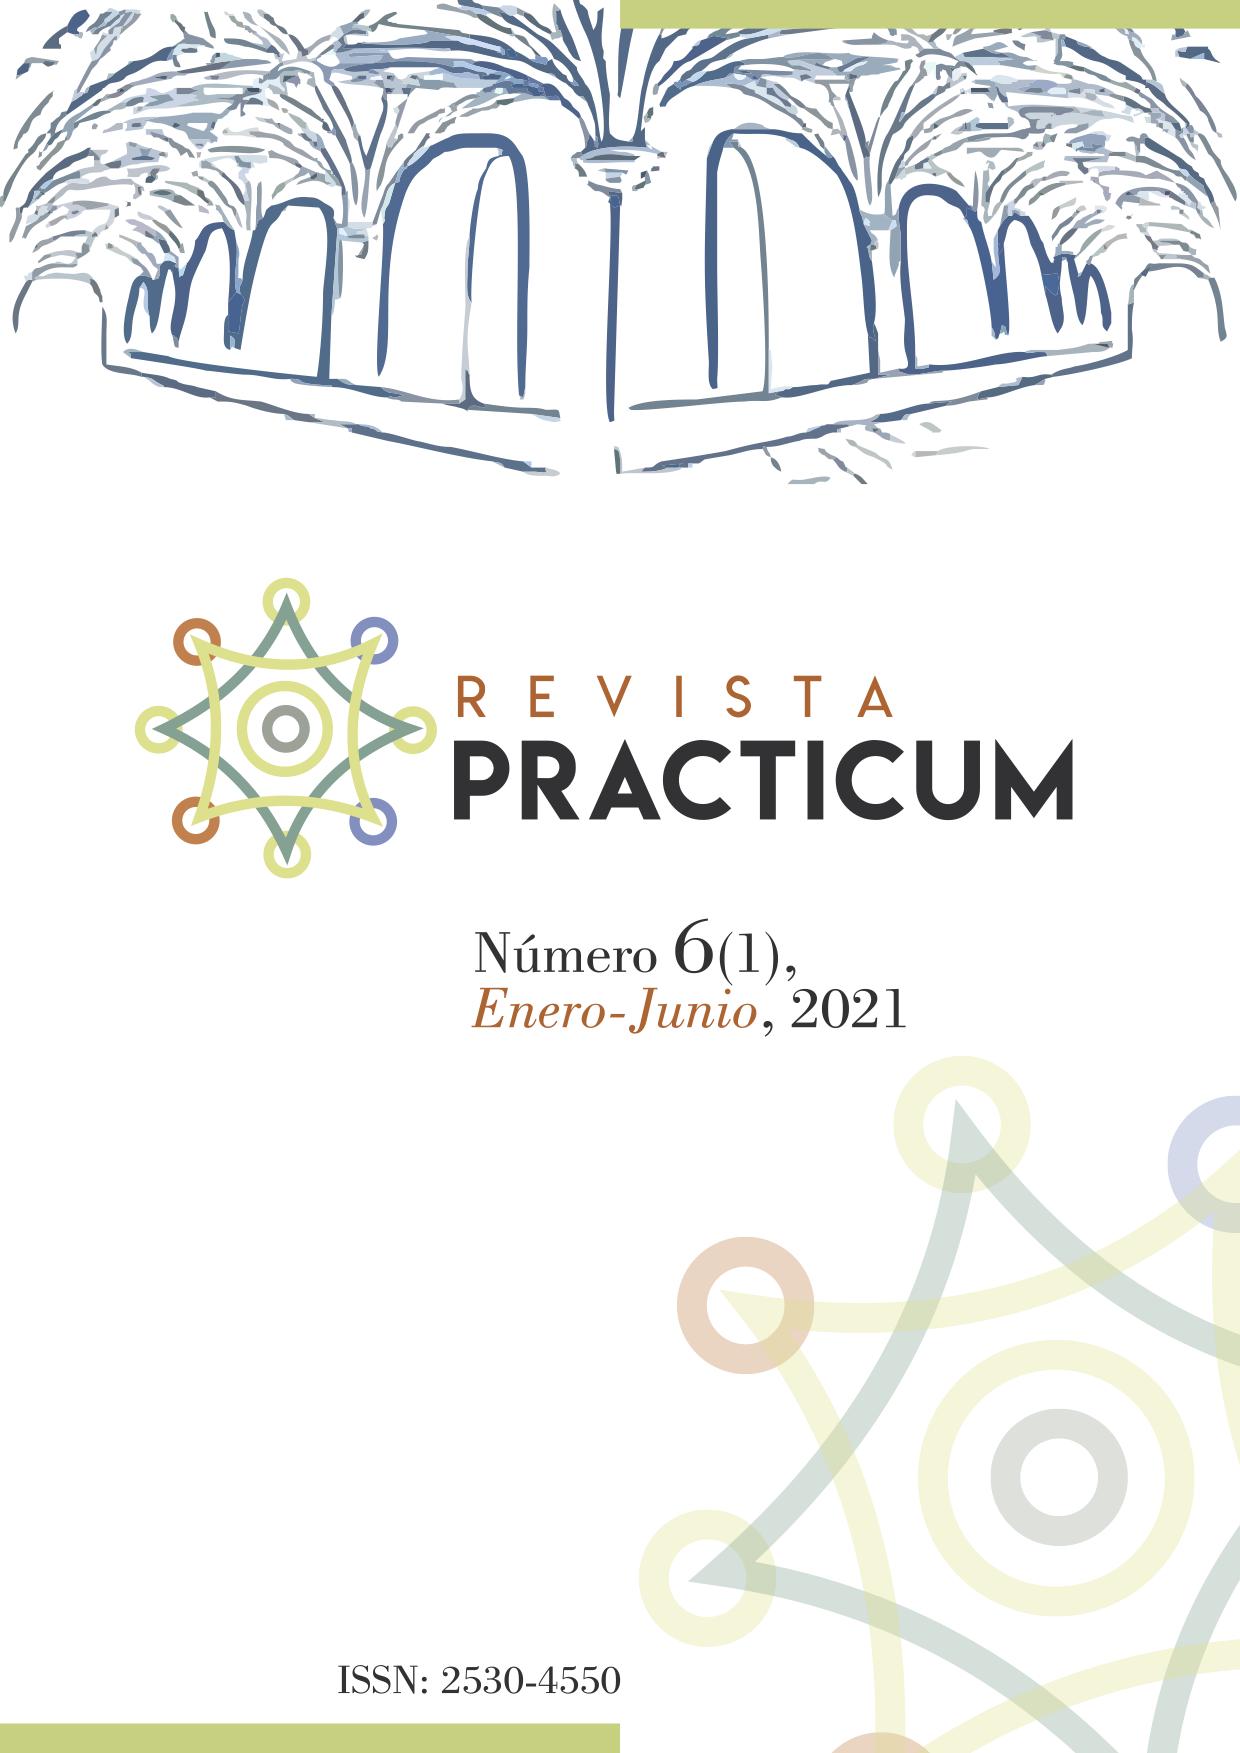 Revista `Practicum Número 6(1), Enero-Junio, 2021